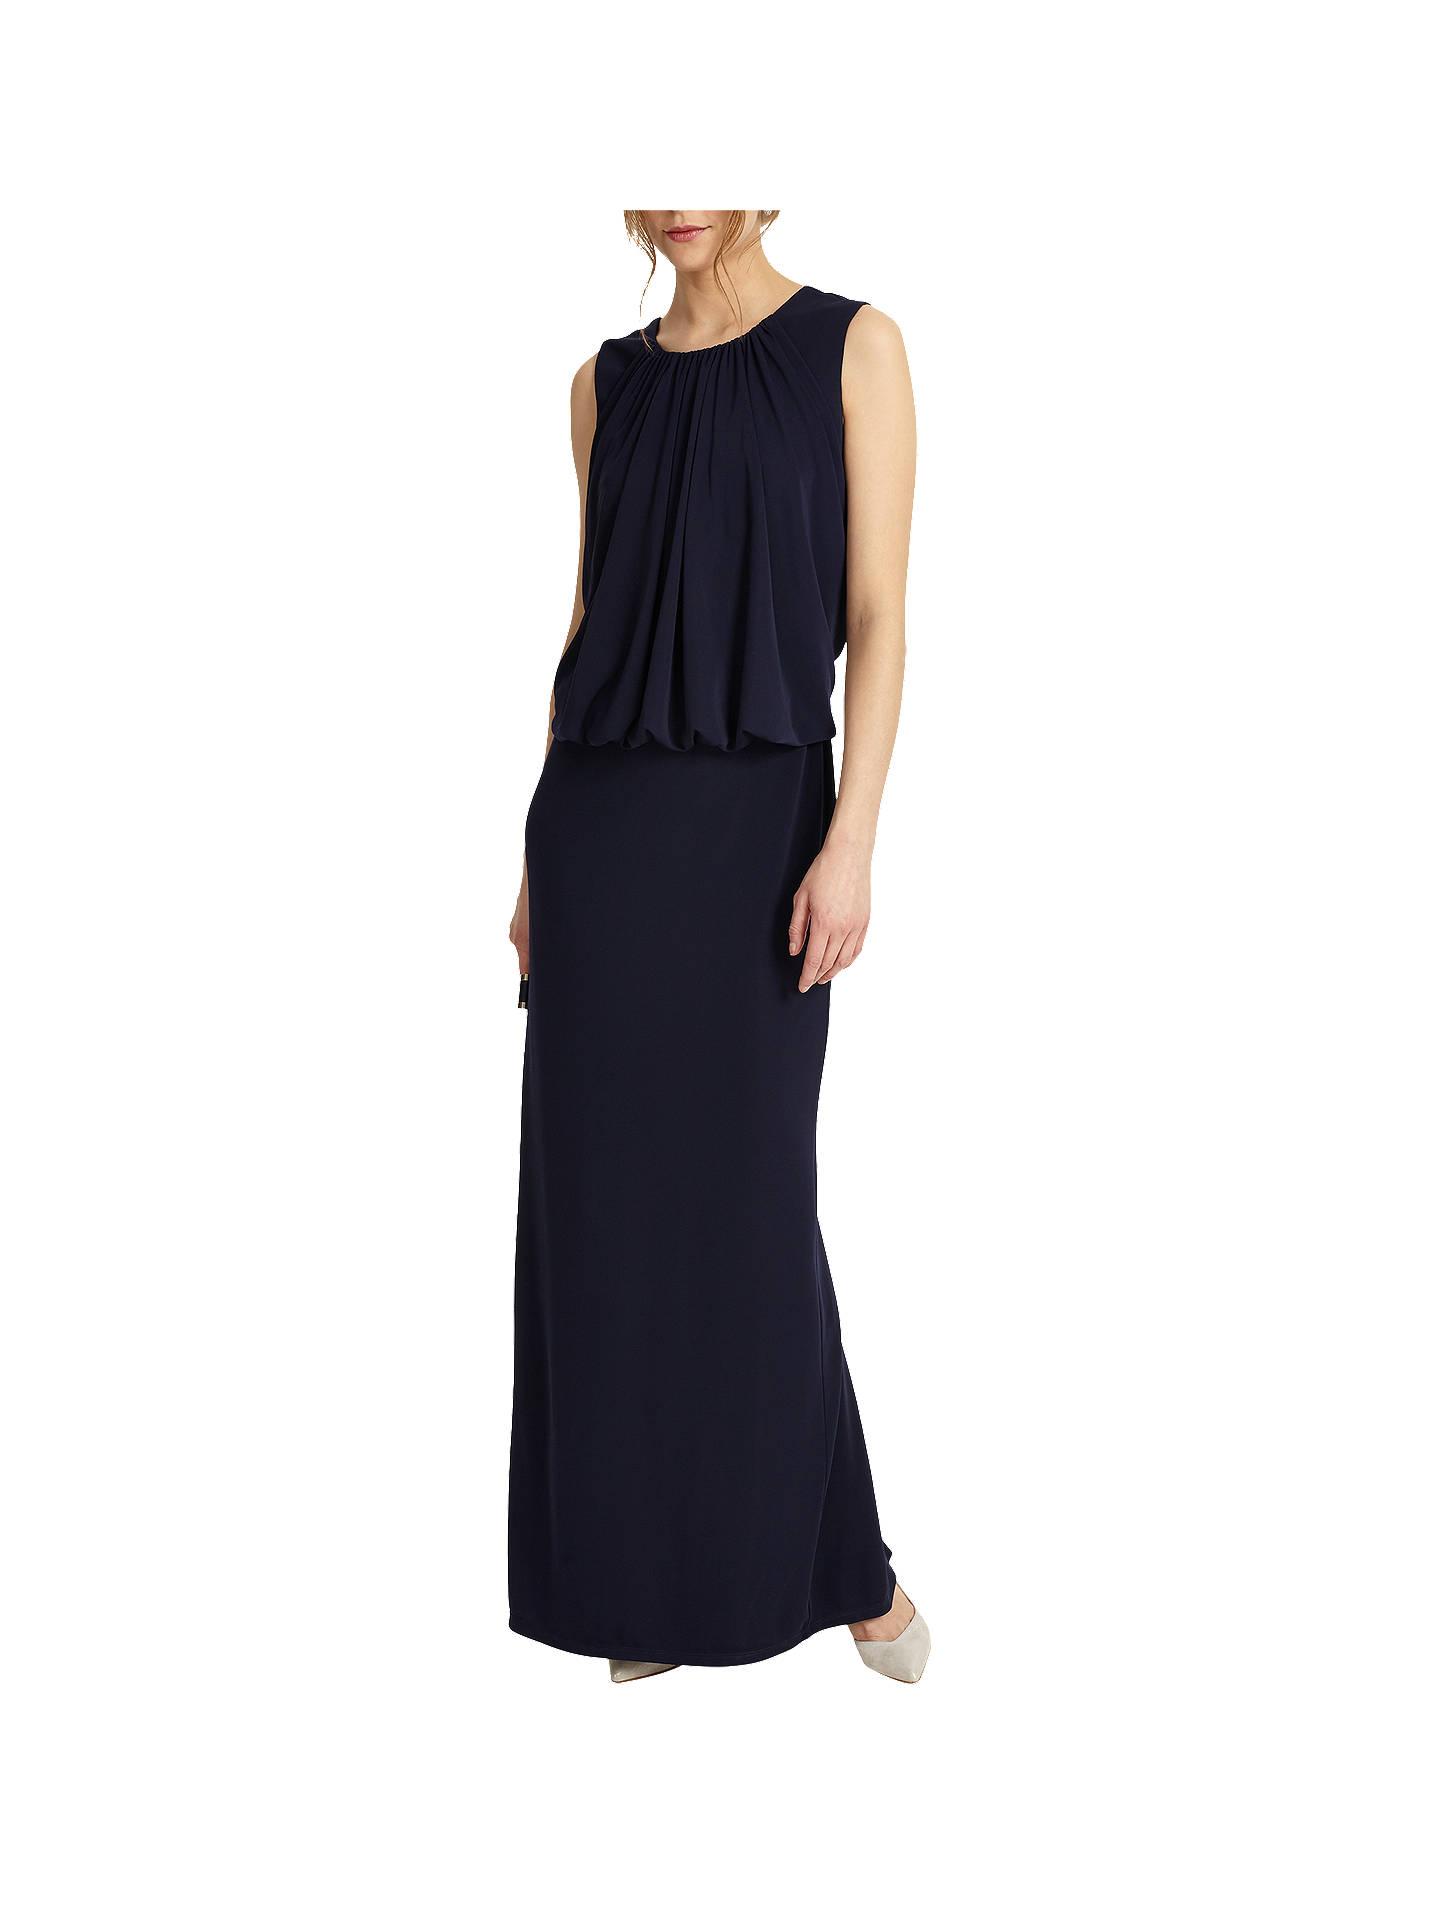 Phase Eight Abbie Maxi Dress at John Lewis & Partners